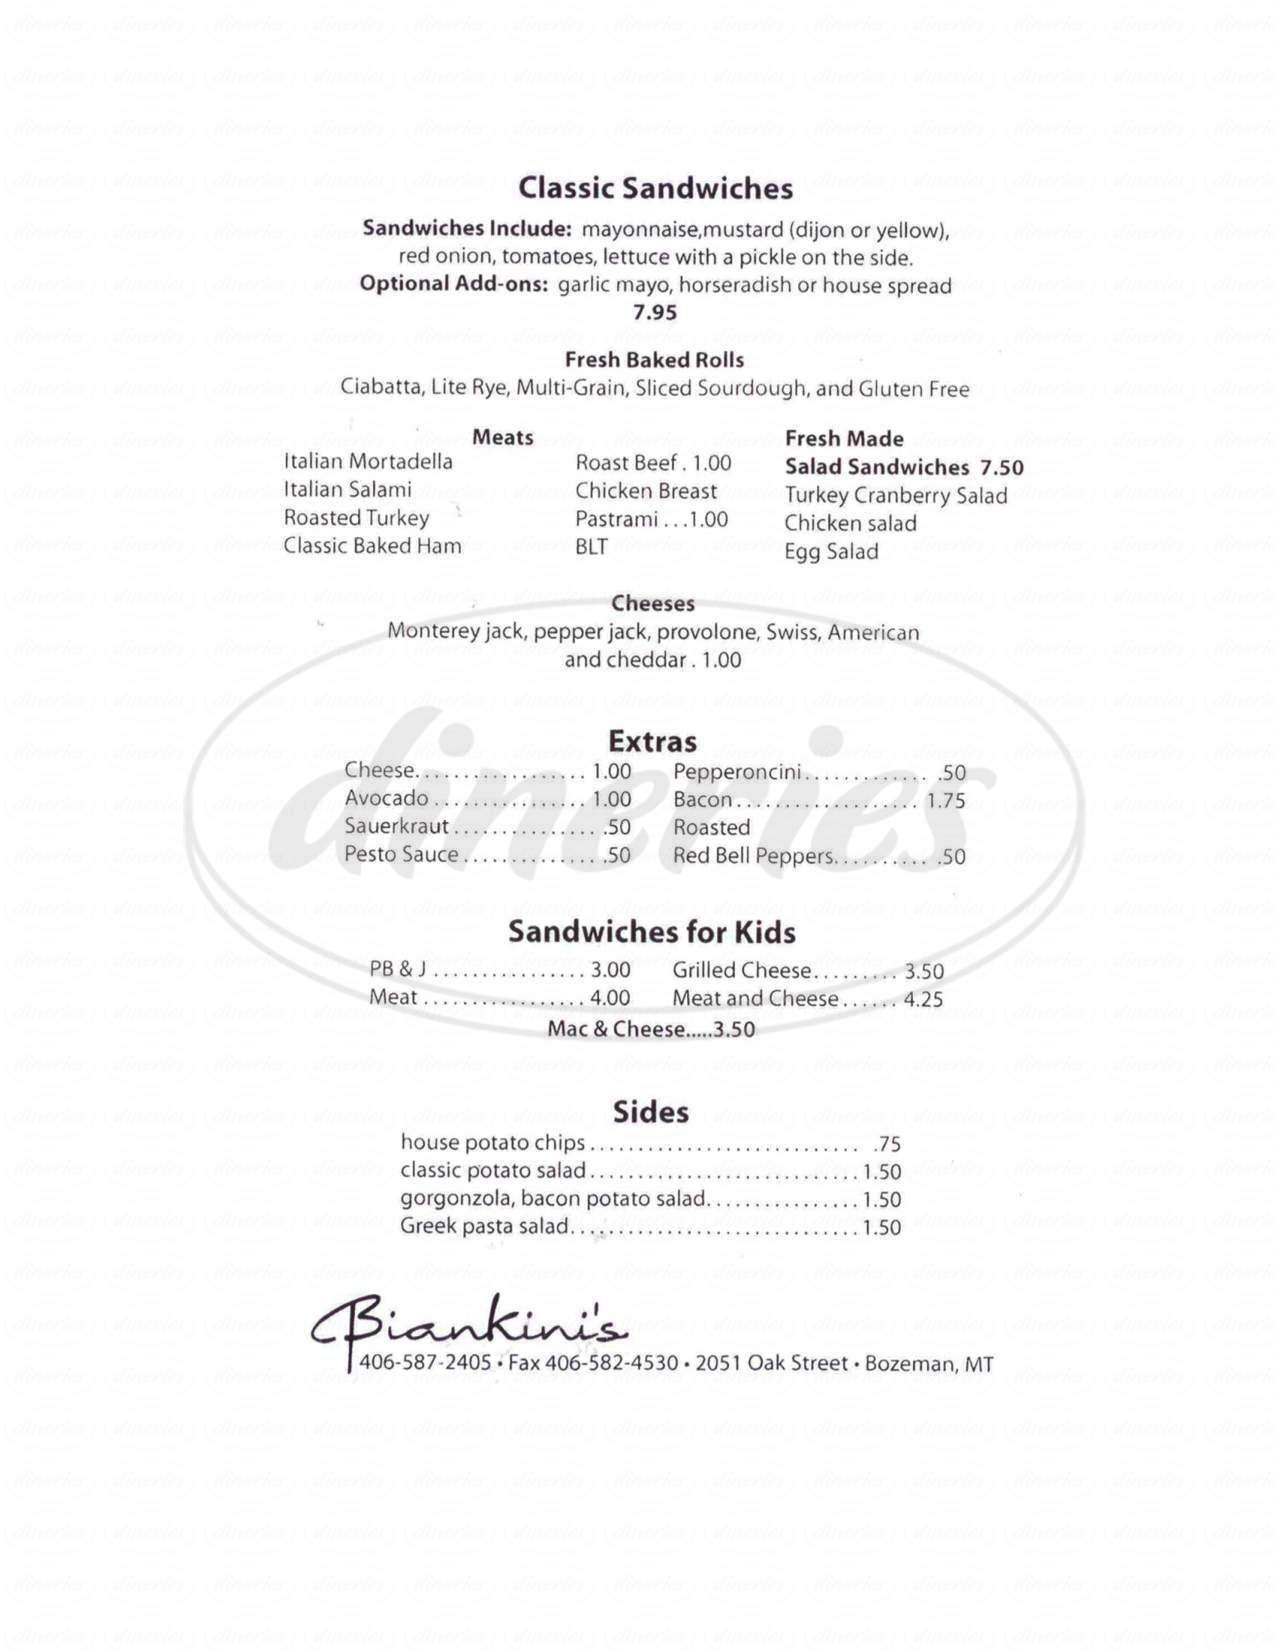 menu for Biankini's